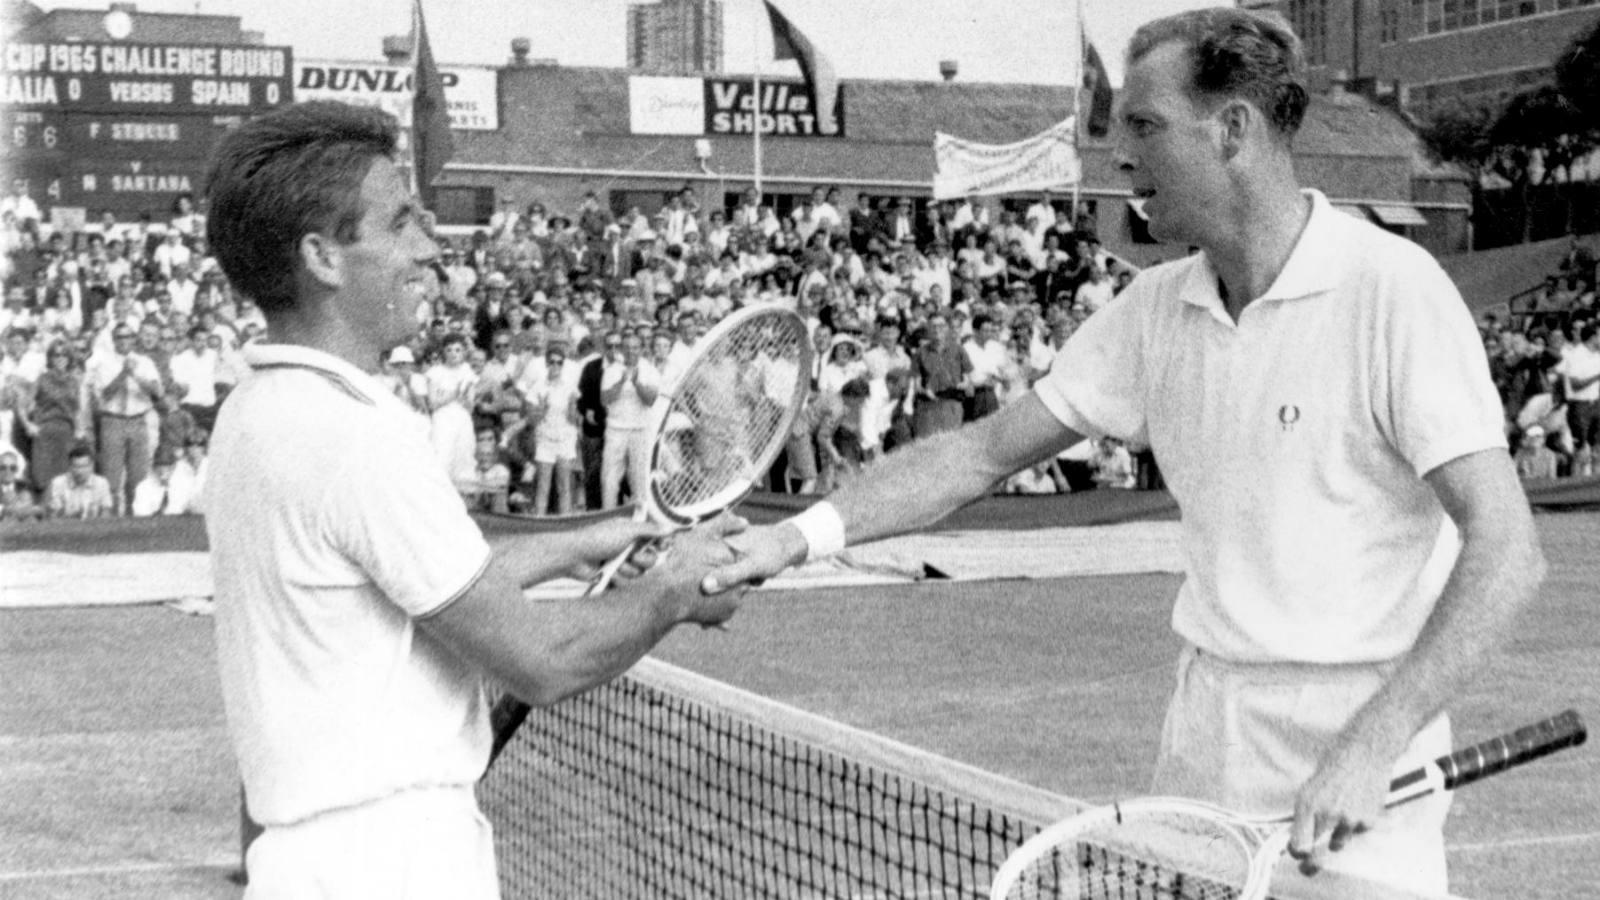 Copa Davis las siete finales espa±olas Deportes ABC Tenis ABC